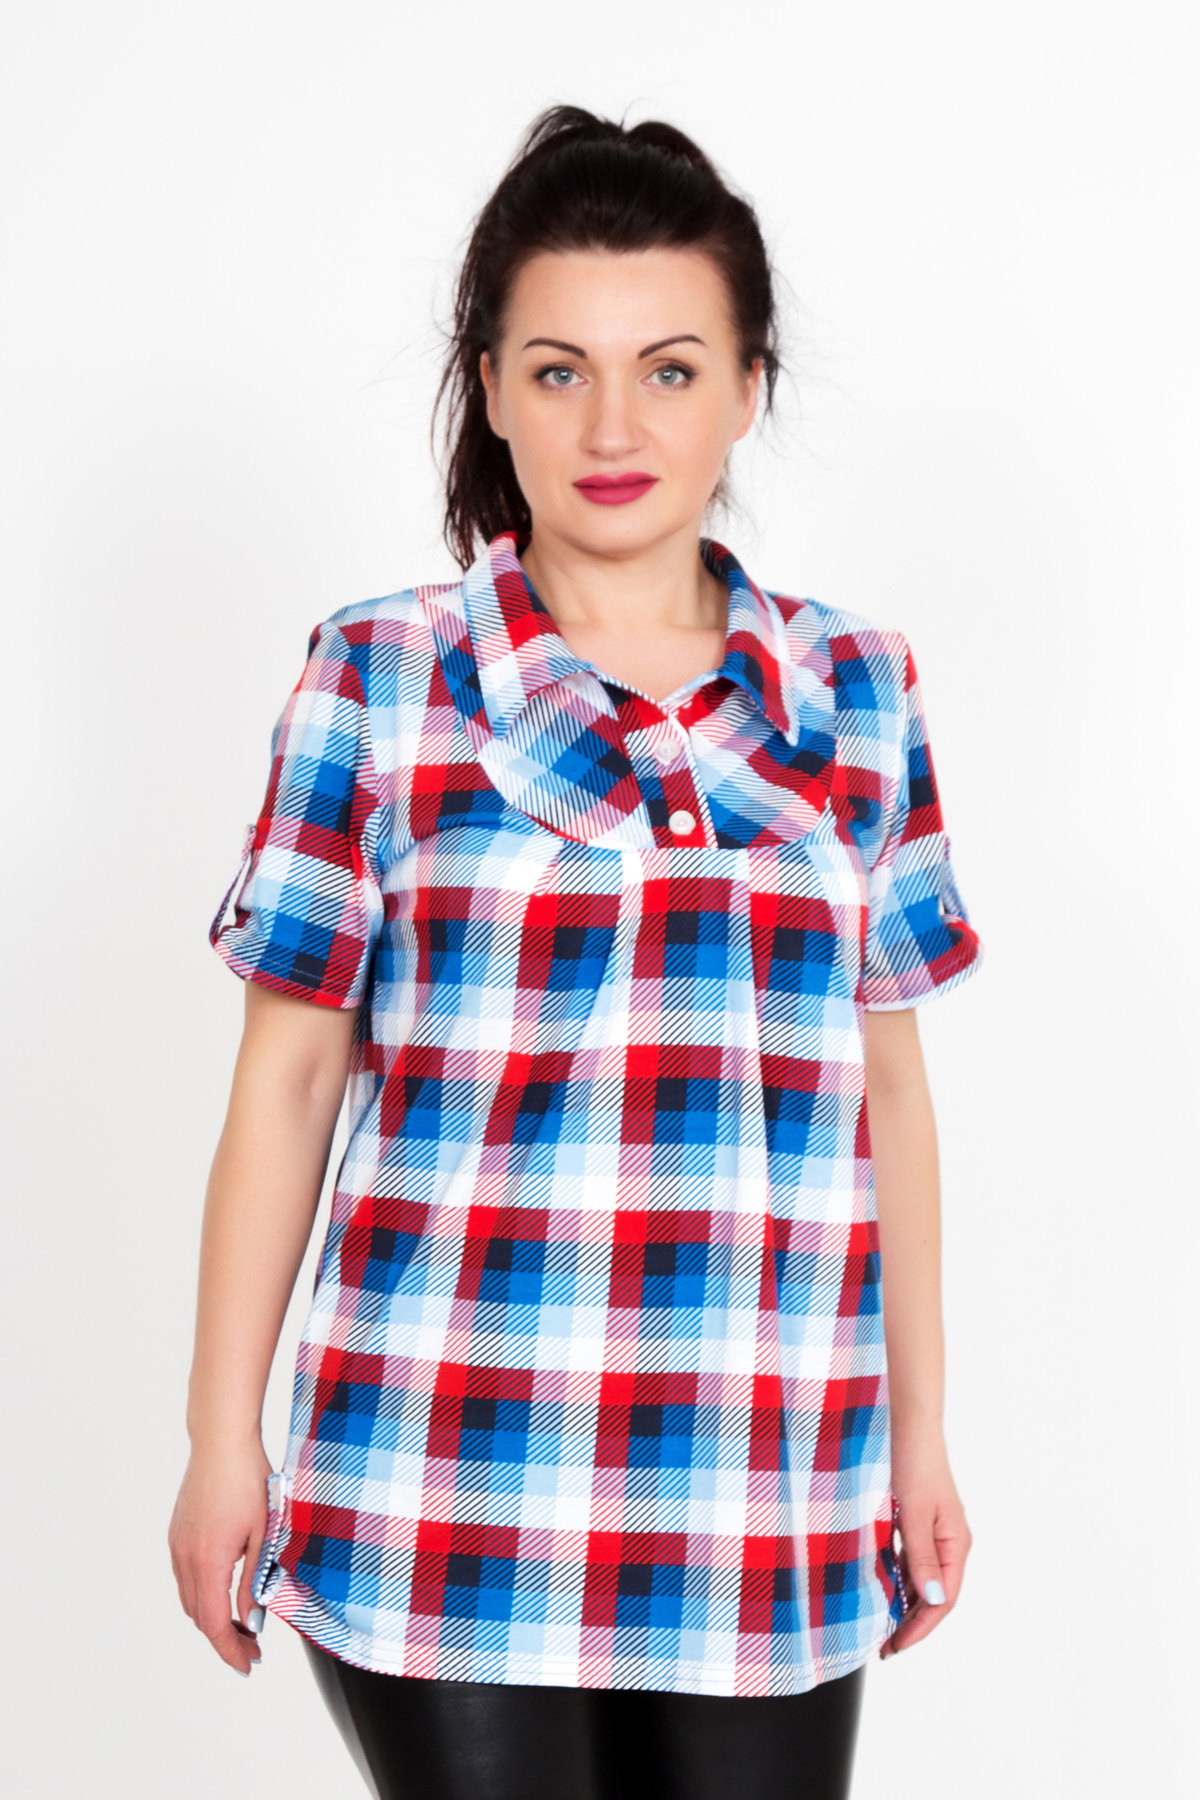 Жен. блуза Юнона Красный р. 66Блузы<br>Обхват груди:132 см<br>Обхват талии:113 см<br>Обхват бедер:140 см<br>Длина по спинке:79 см<br>Рост:167 см<br><br>Тип: Жен. блуза<br>Размер: 66<br>Материал: Кулирка